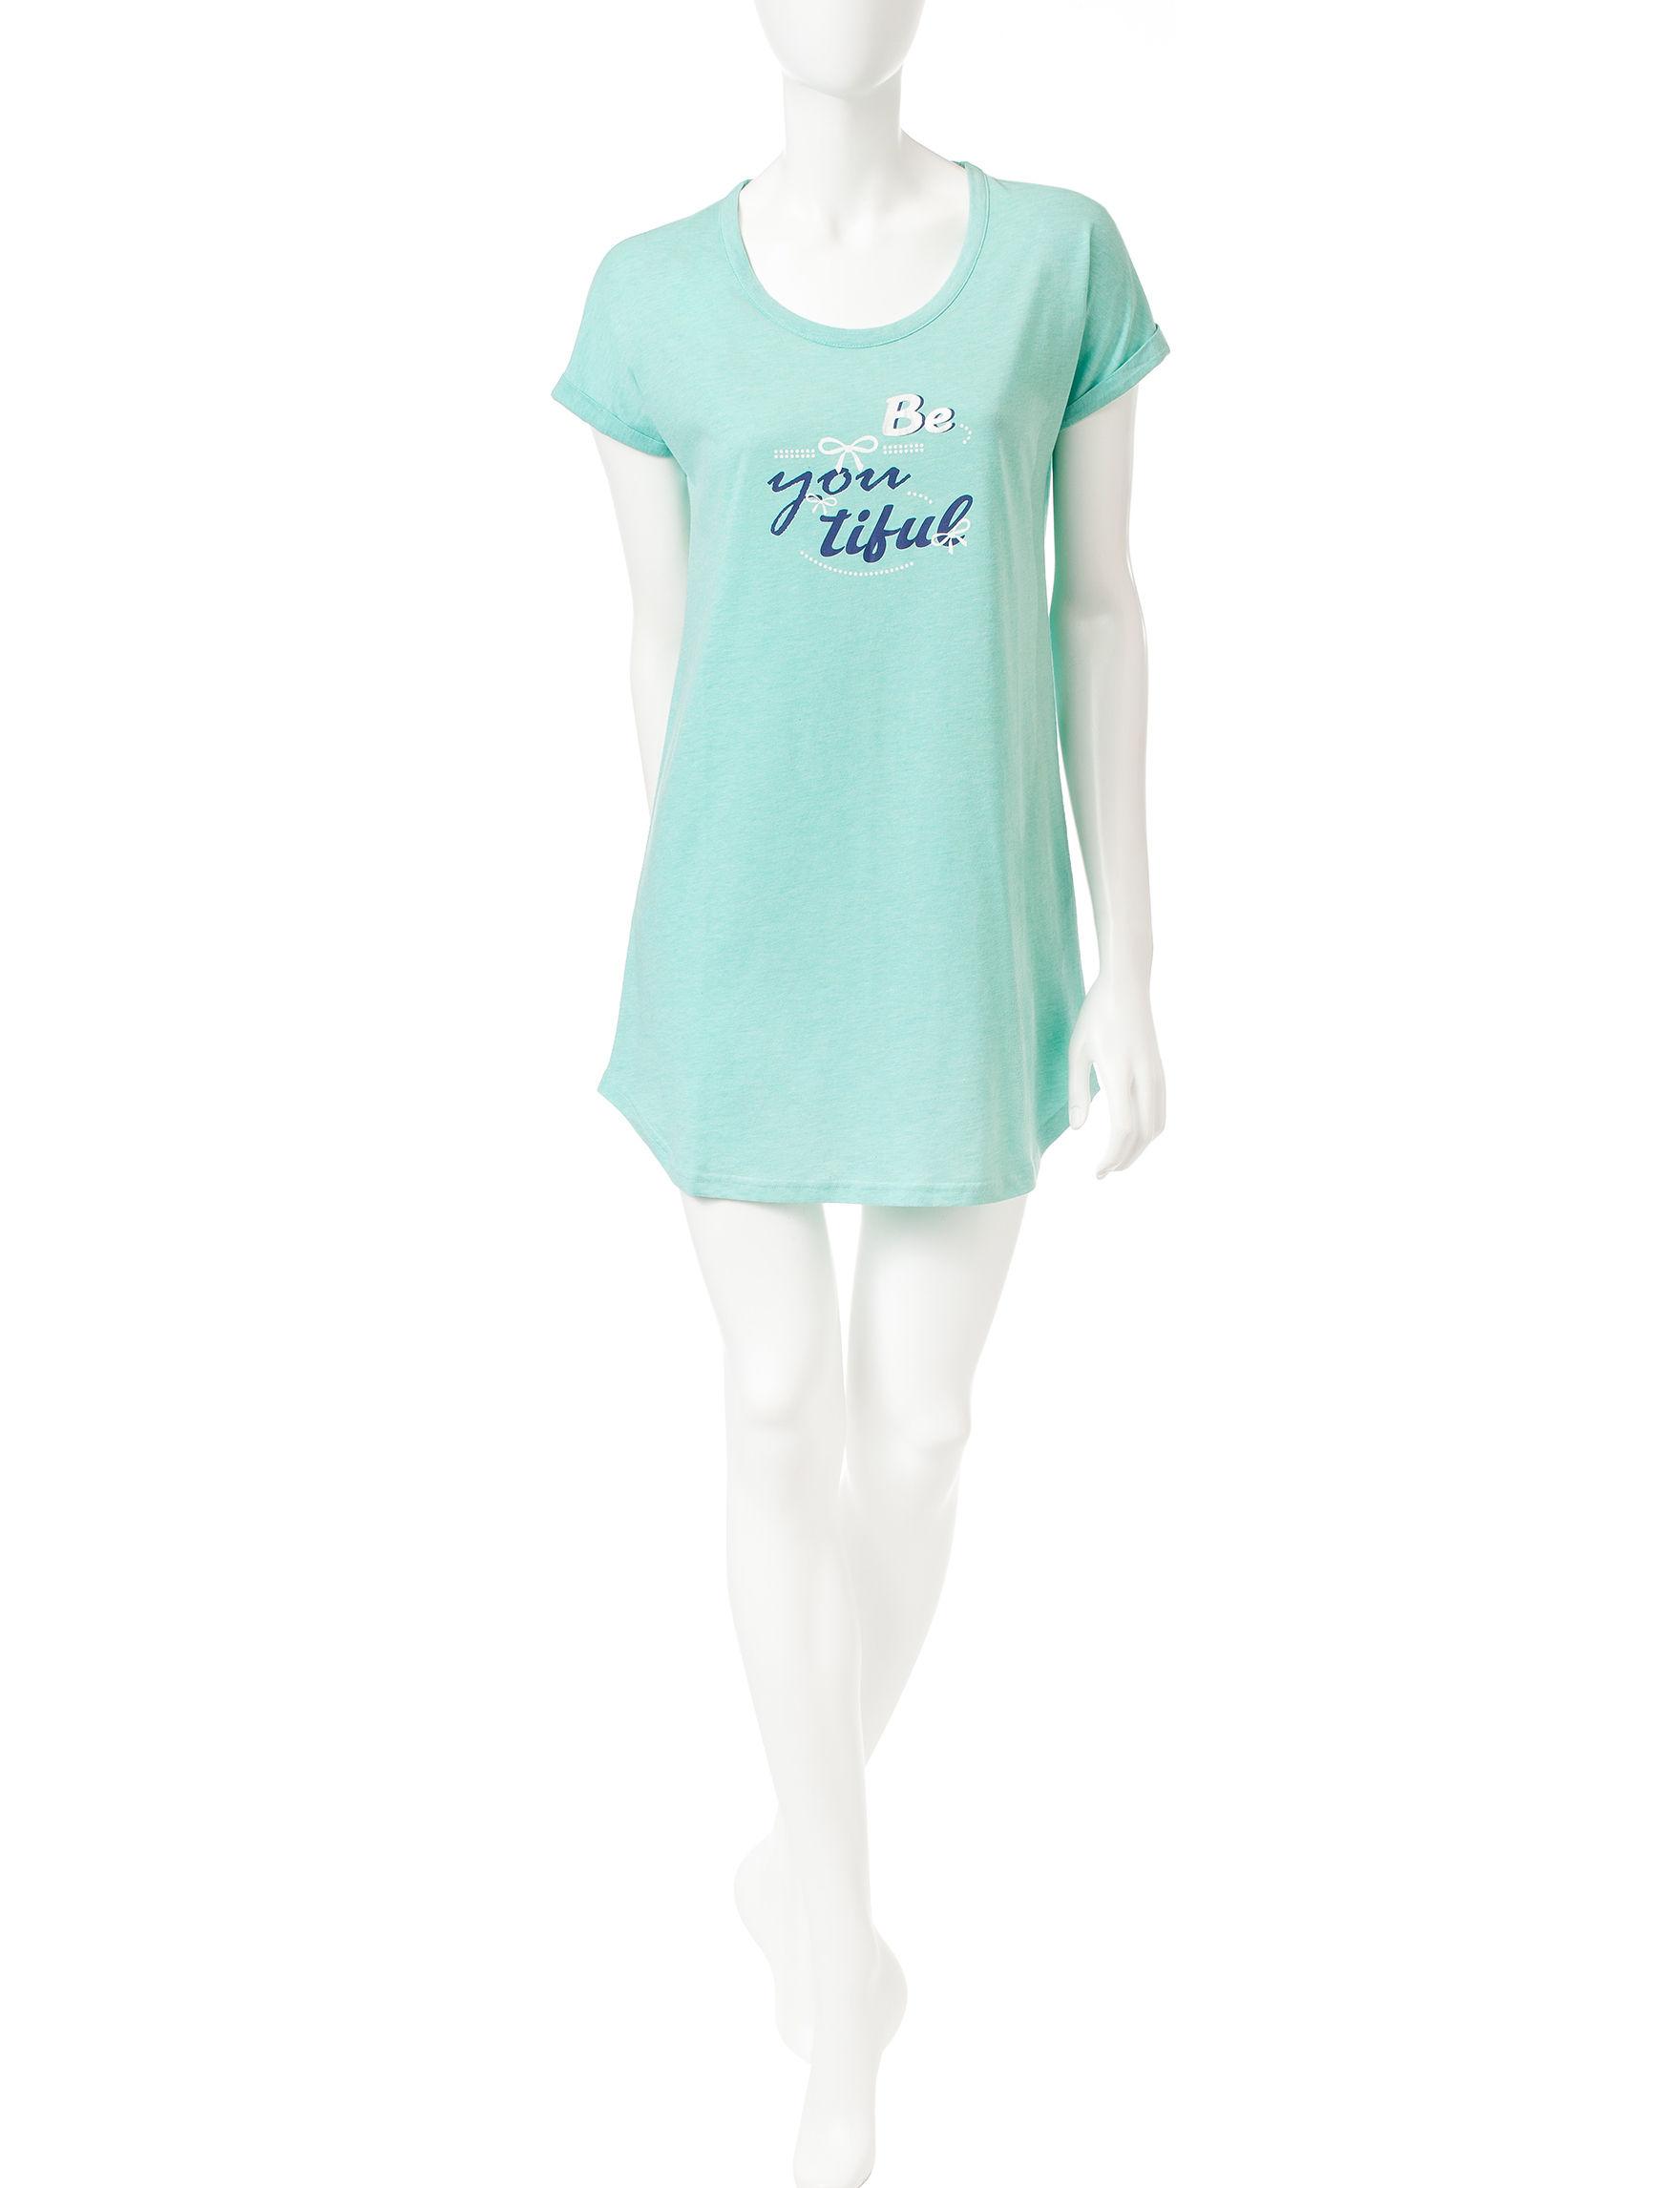 Goodnight Kiss Blue Nightgowns & Sleep Shirts